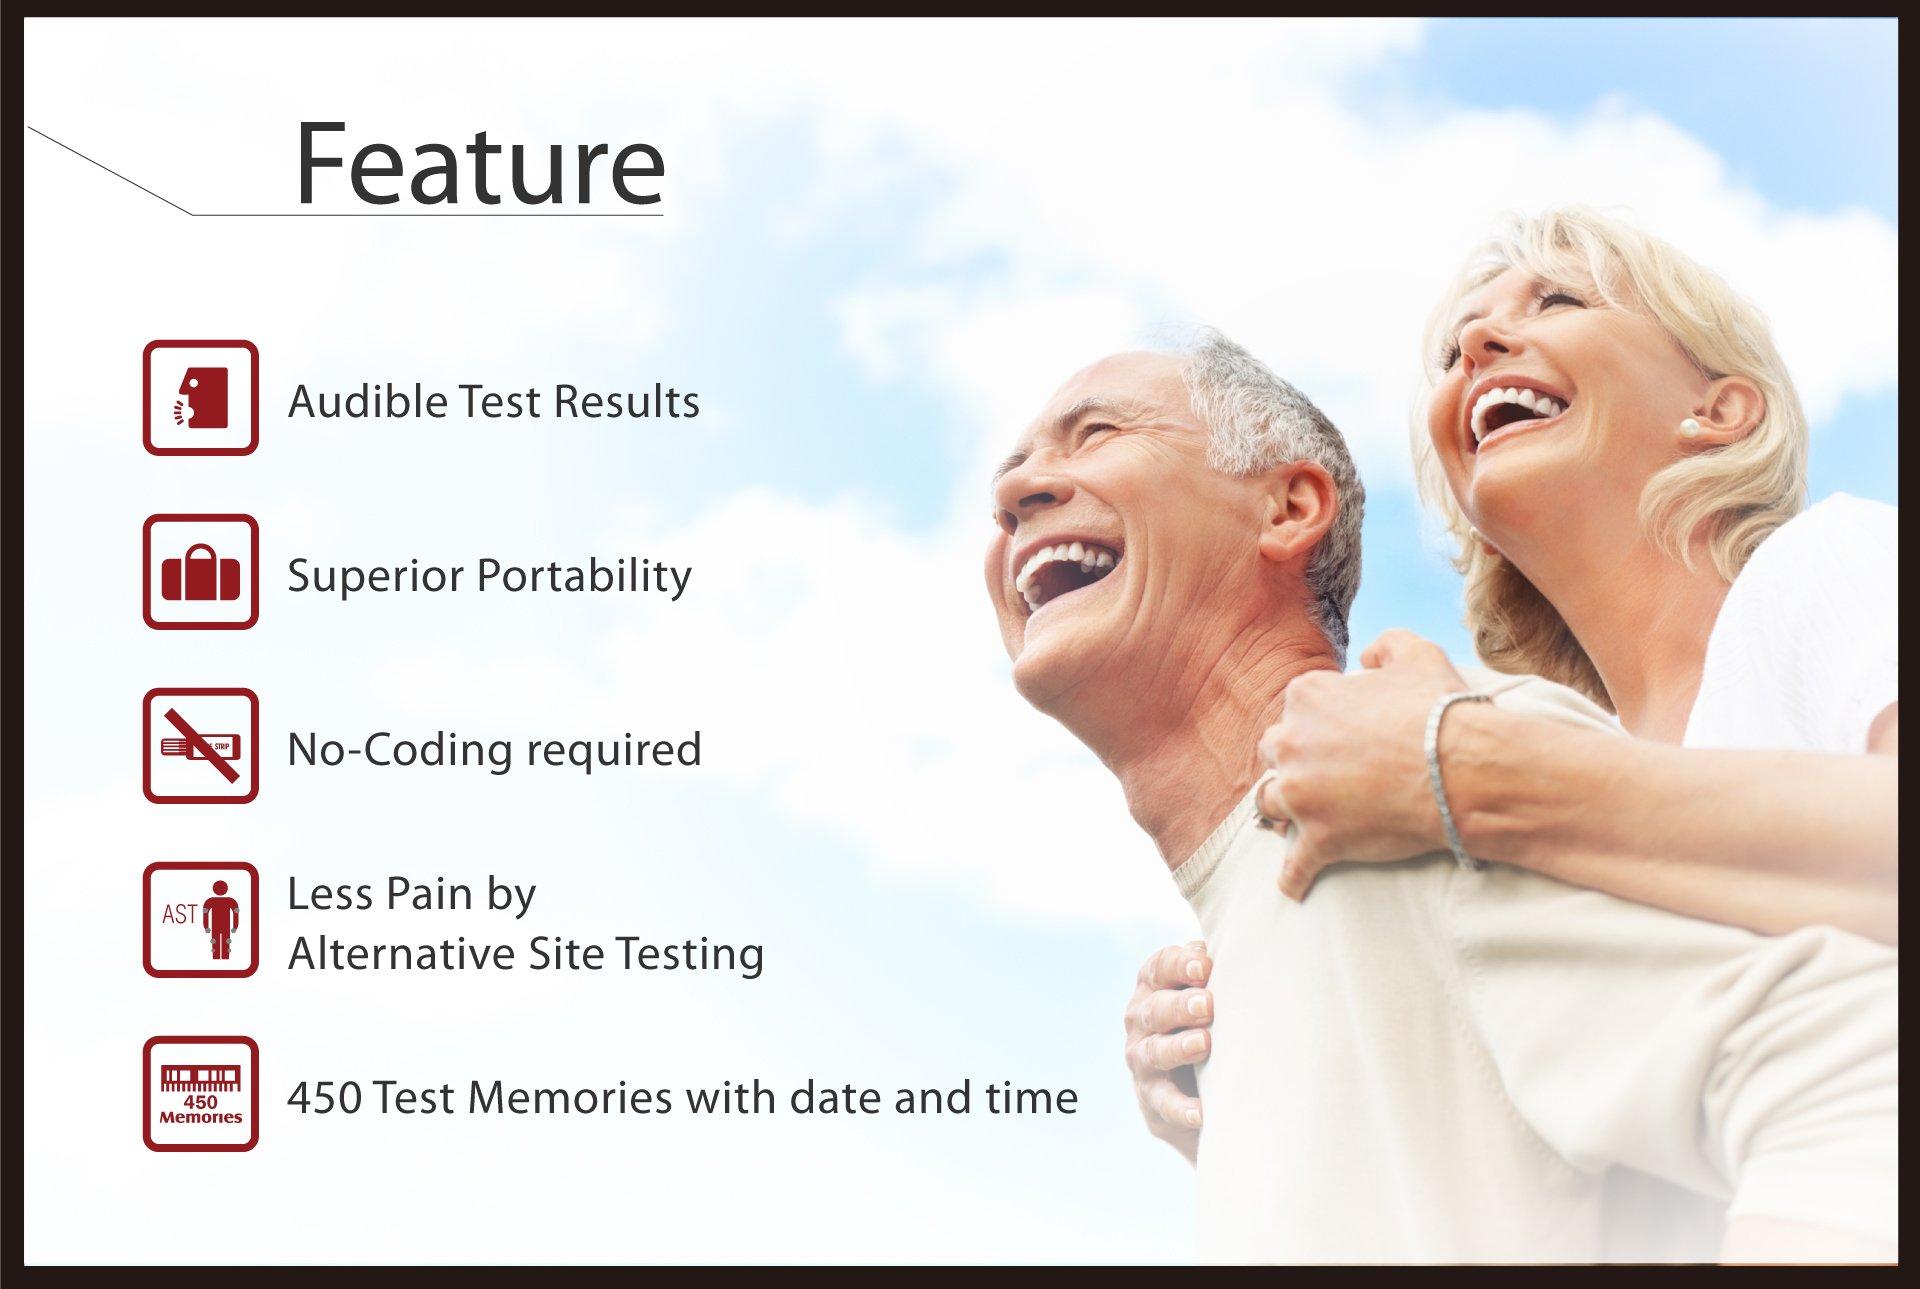 Pro Voice V9 Diabetes Testing kit (1 Pro Voice V9 Talking Meter, 100 Test Strips, 100 Lancets, 1 Painless Design Lancing Device & Carry Case)